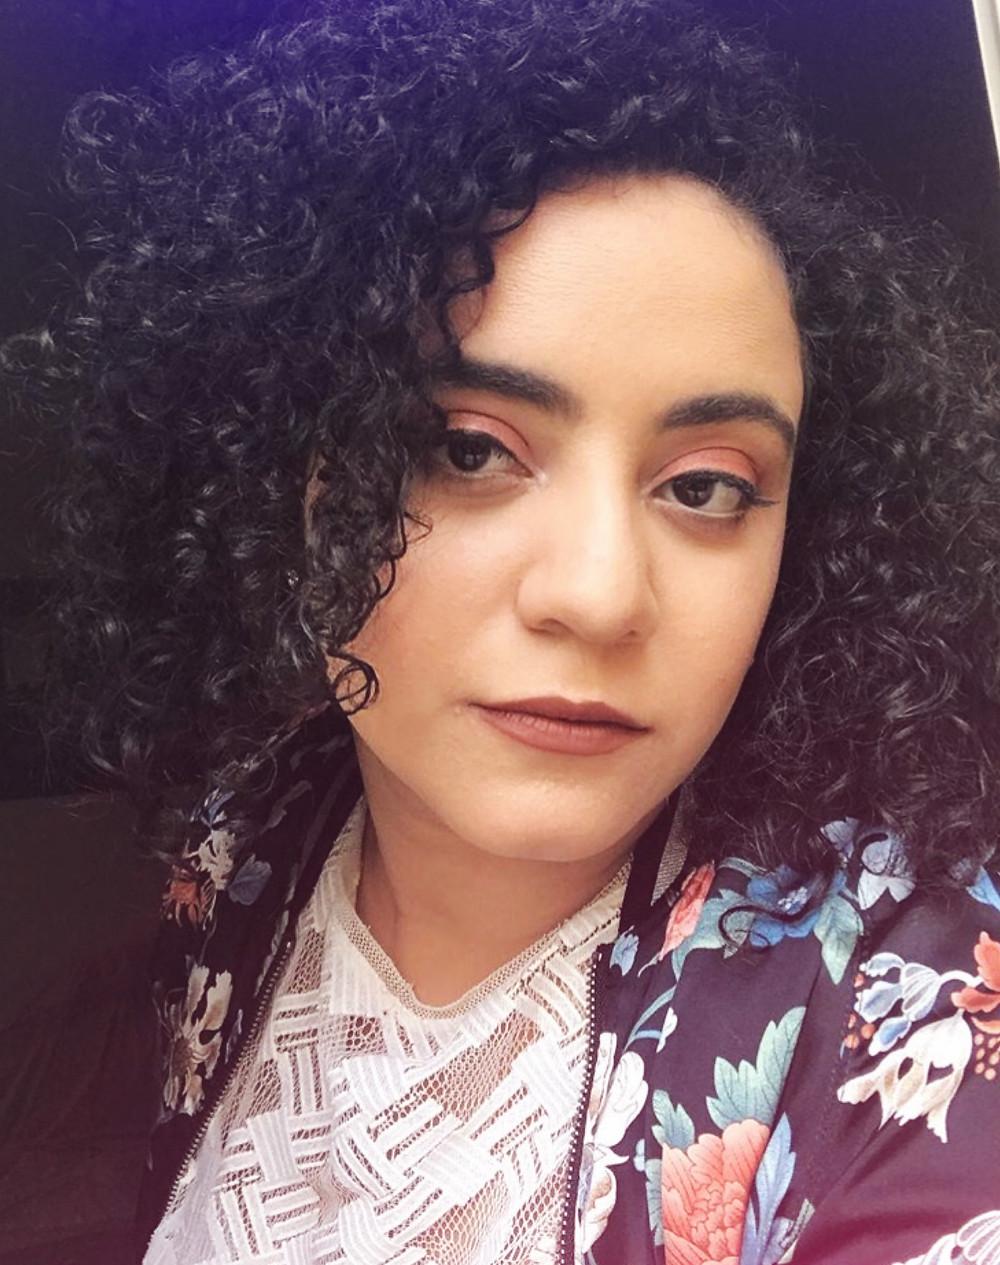 Lobna Hossam makeup artist girl with curly hair